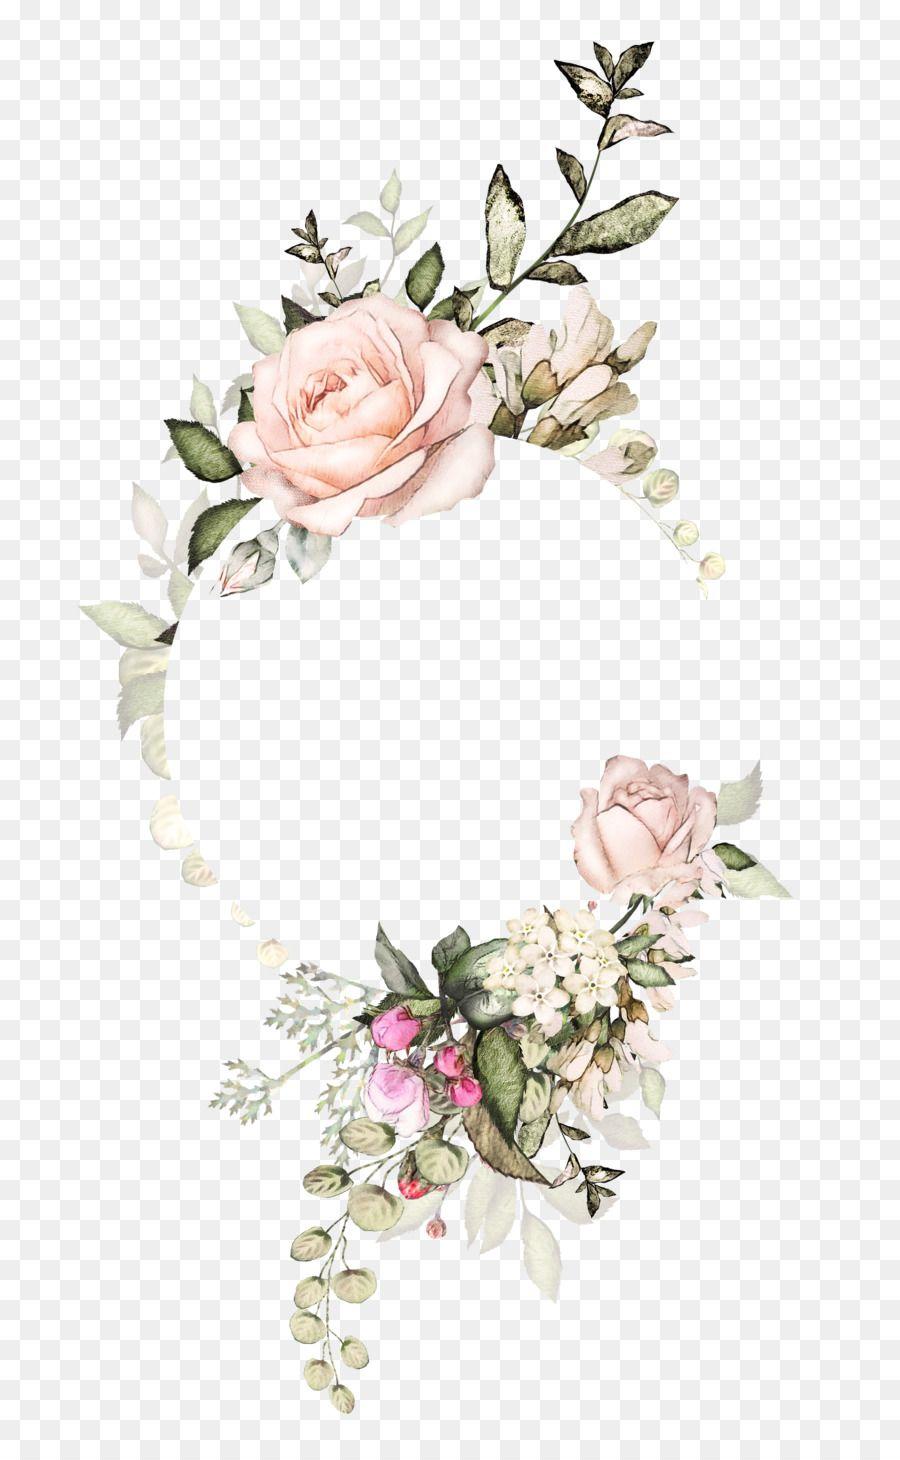 Desain Bunga Undangan Pernikahan Bunga Gambar Png Flower Wedding Invitation Flower Graphic Design Flower Graphic